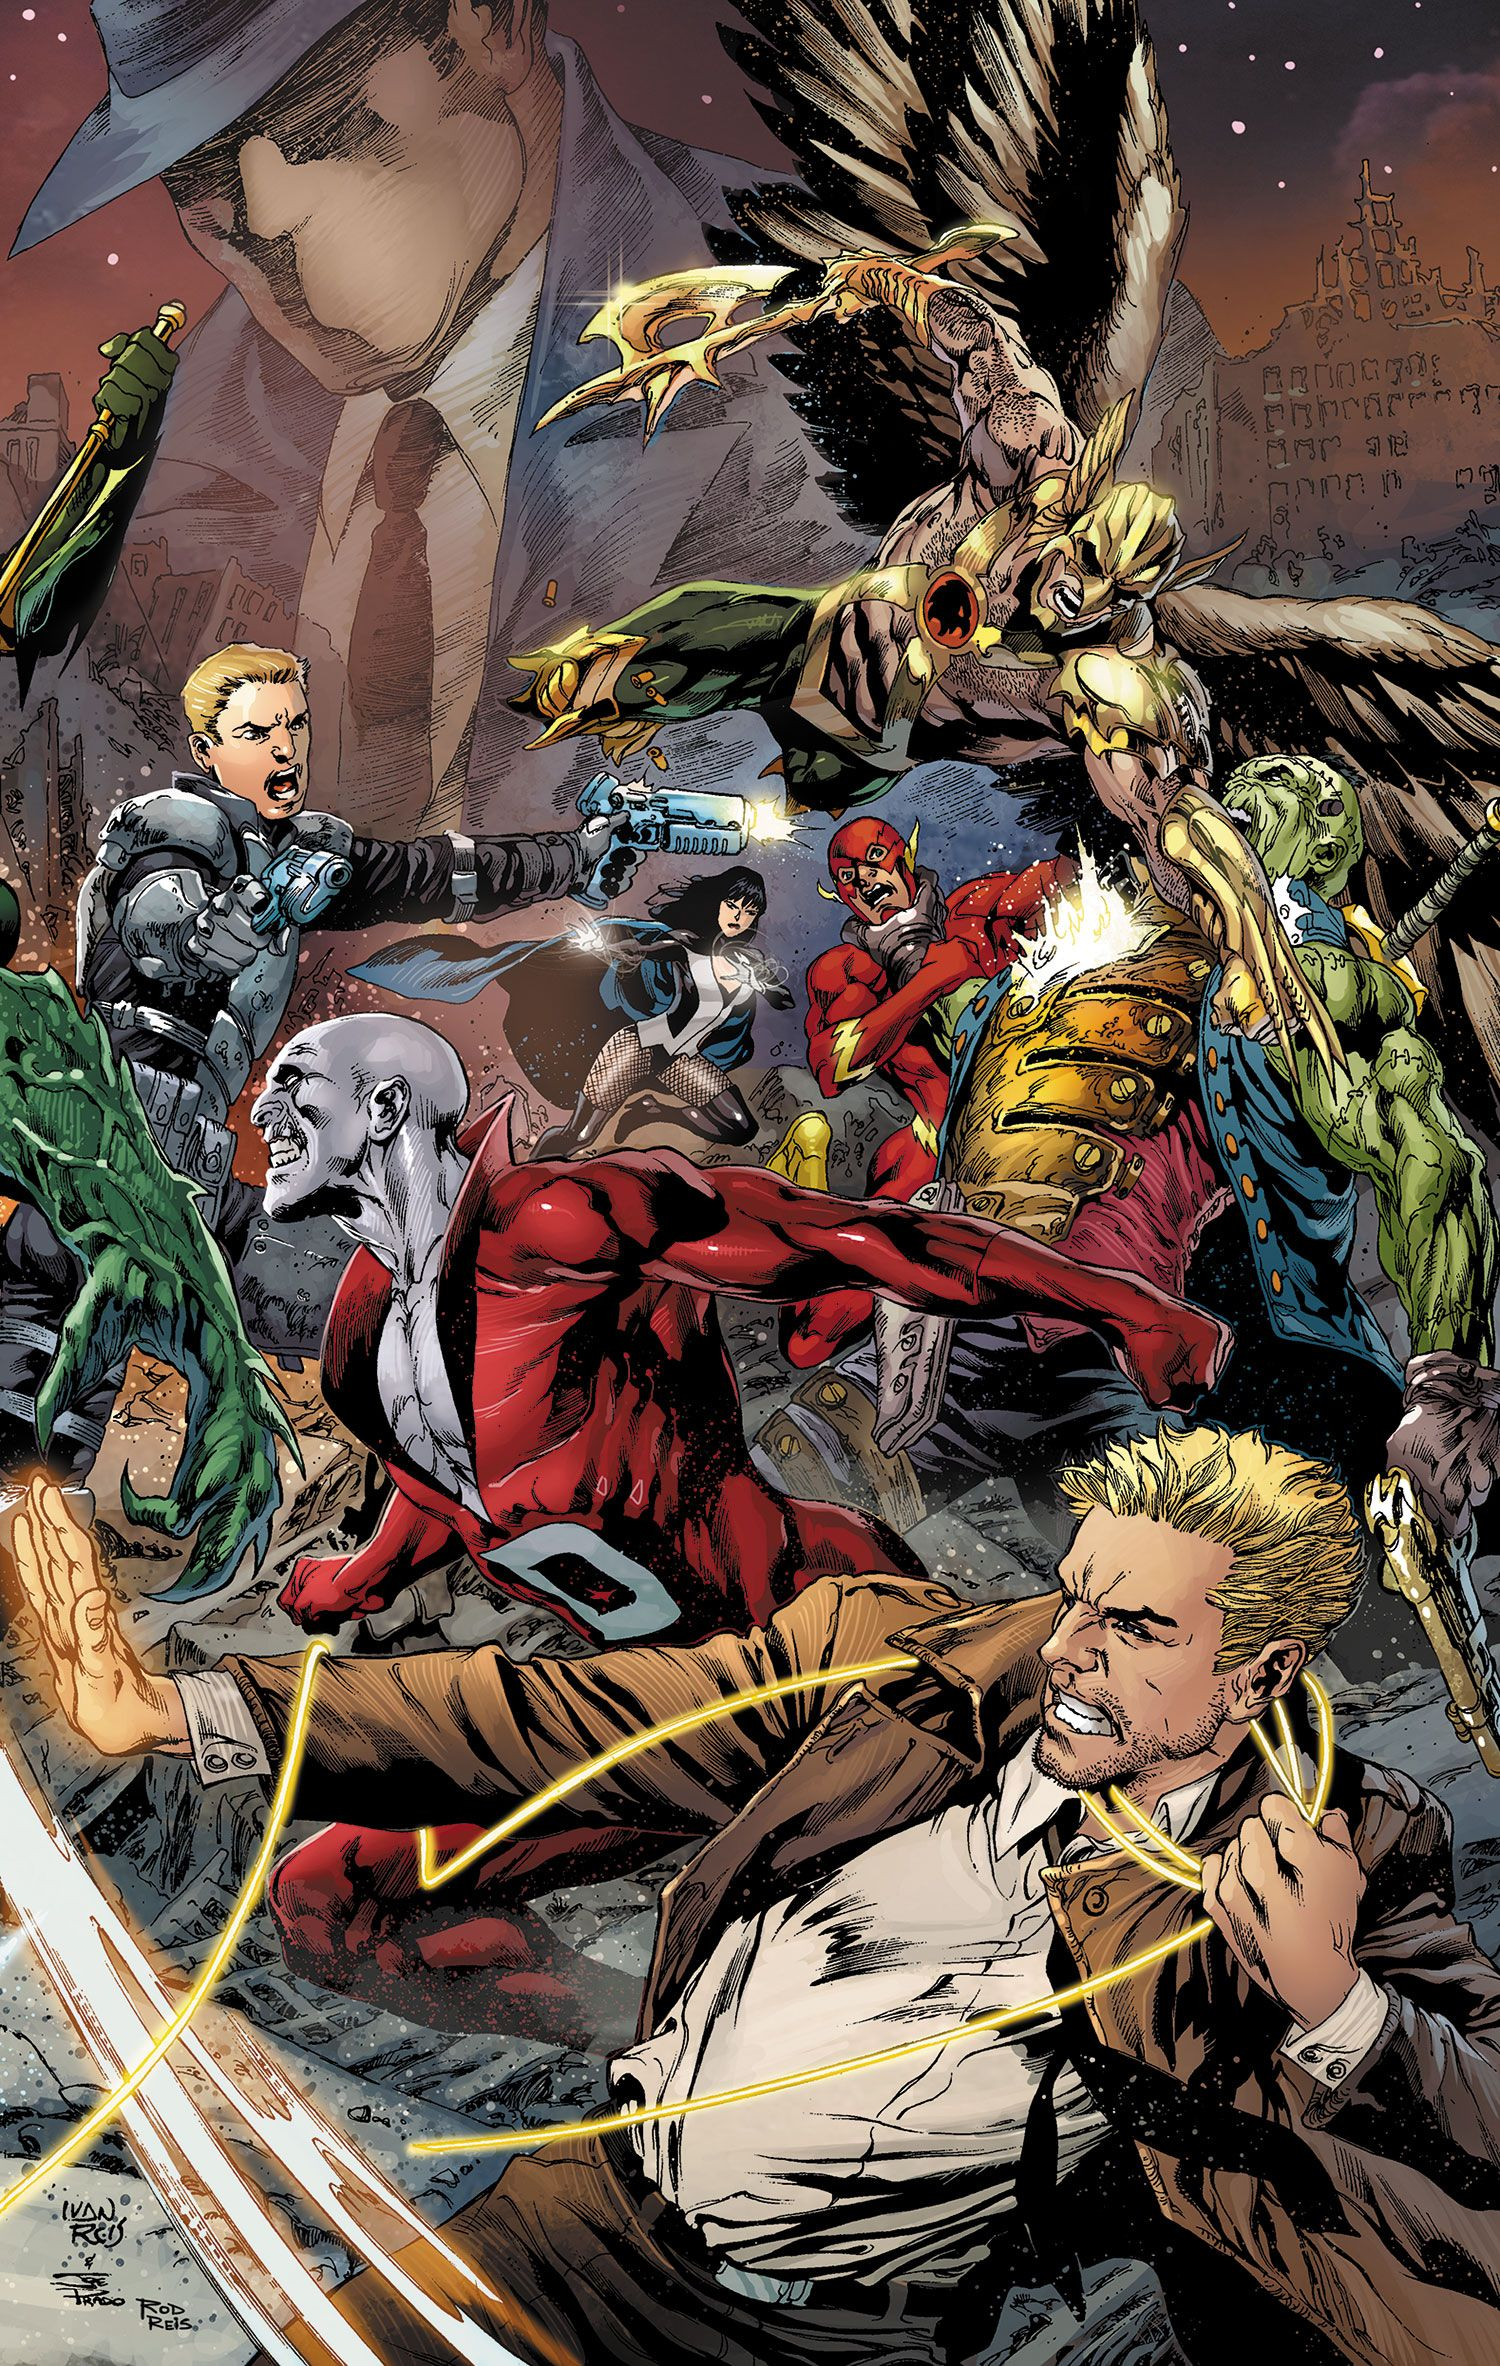 Justice League Dark Concept Art Revealed By Joseph Kahn